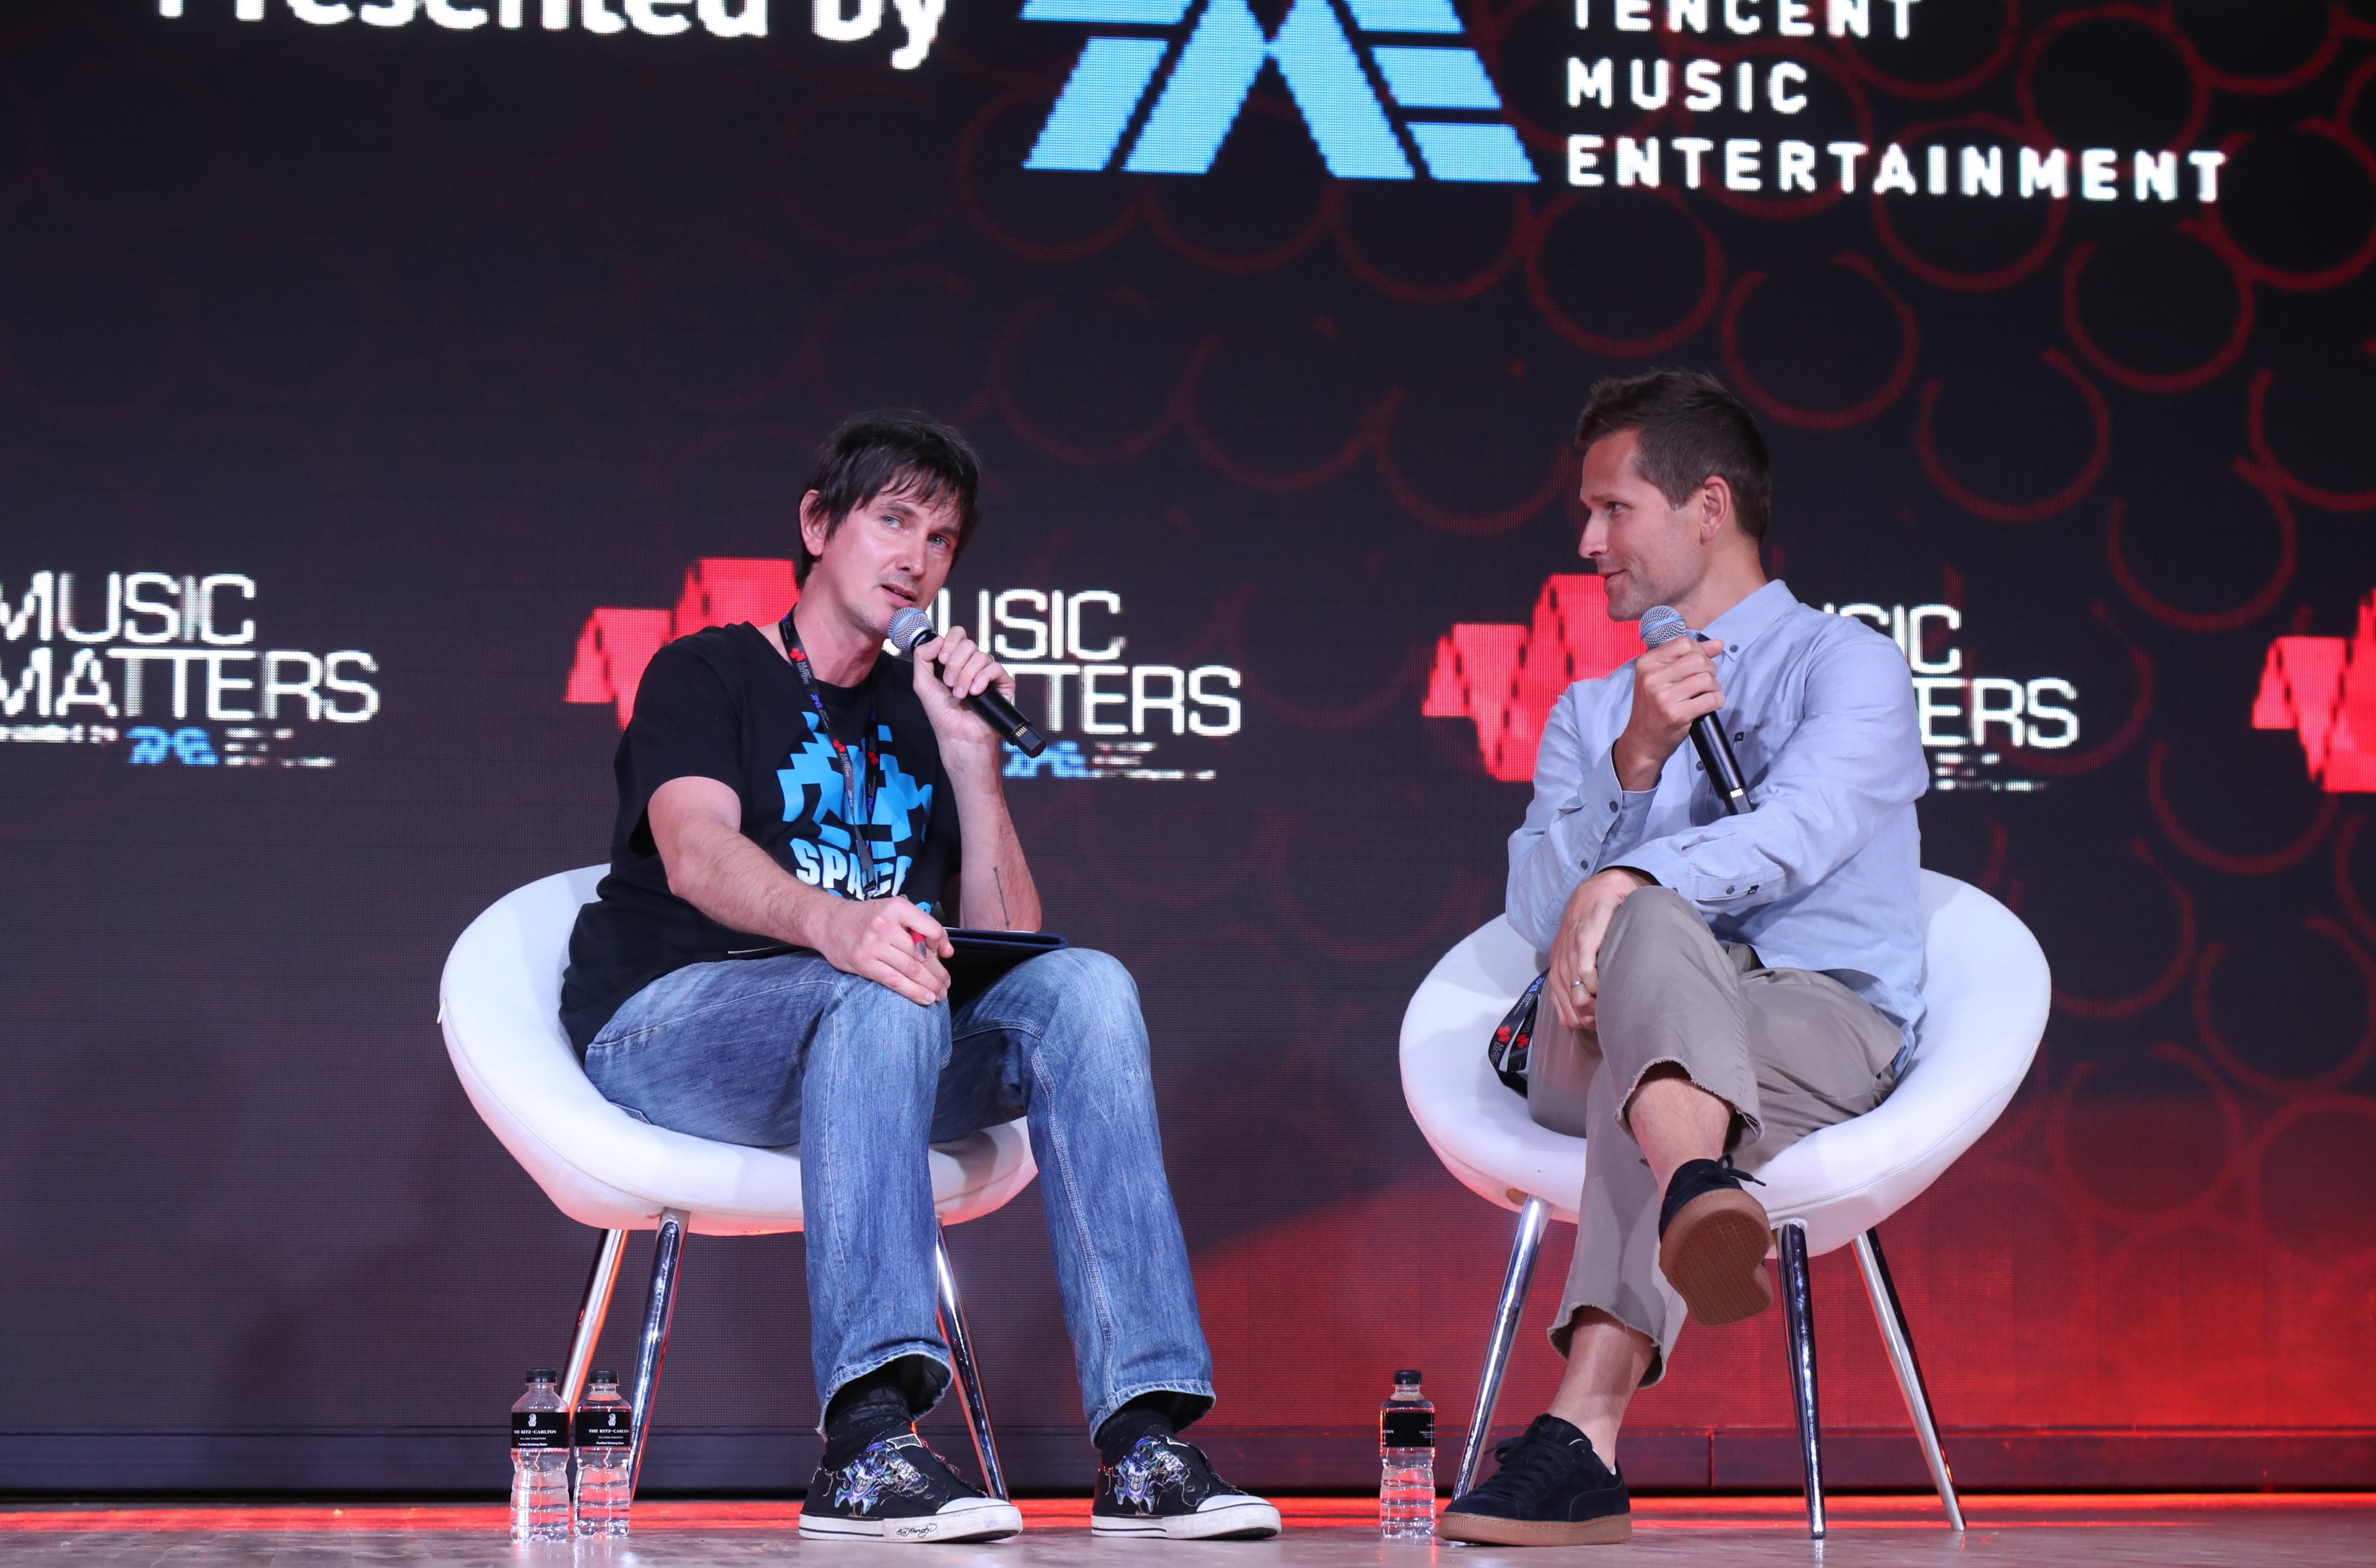 Billboard's Lars Brandle and veteran DJ Kaskade chat during a keynote session at Music Matters 2018